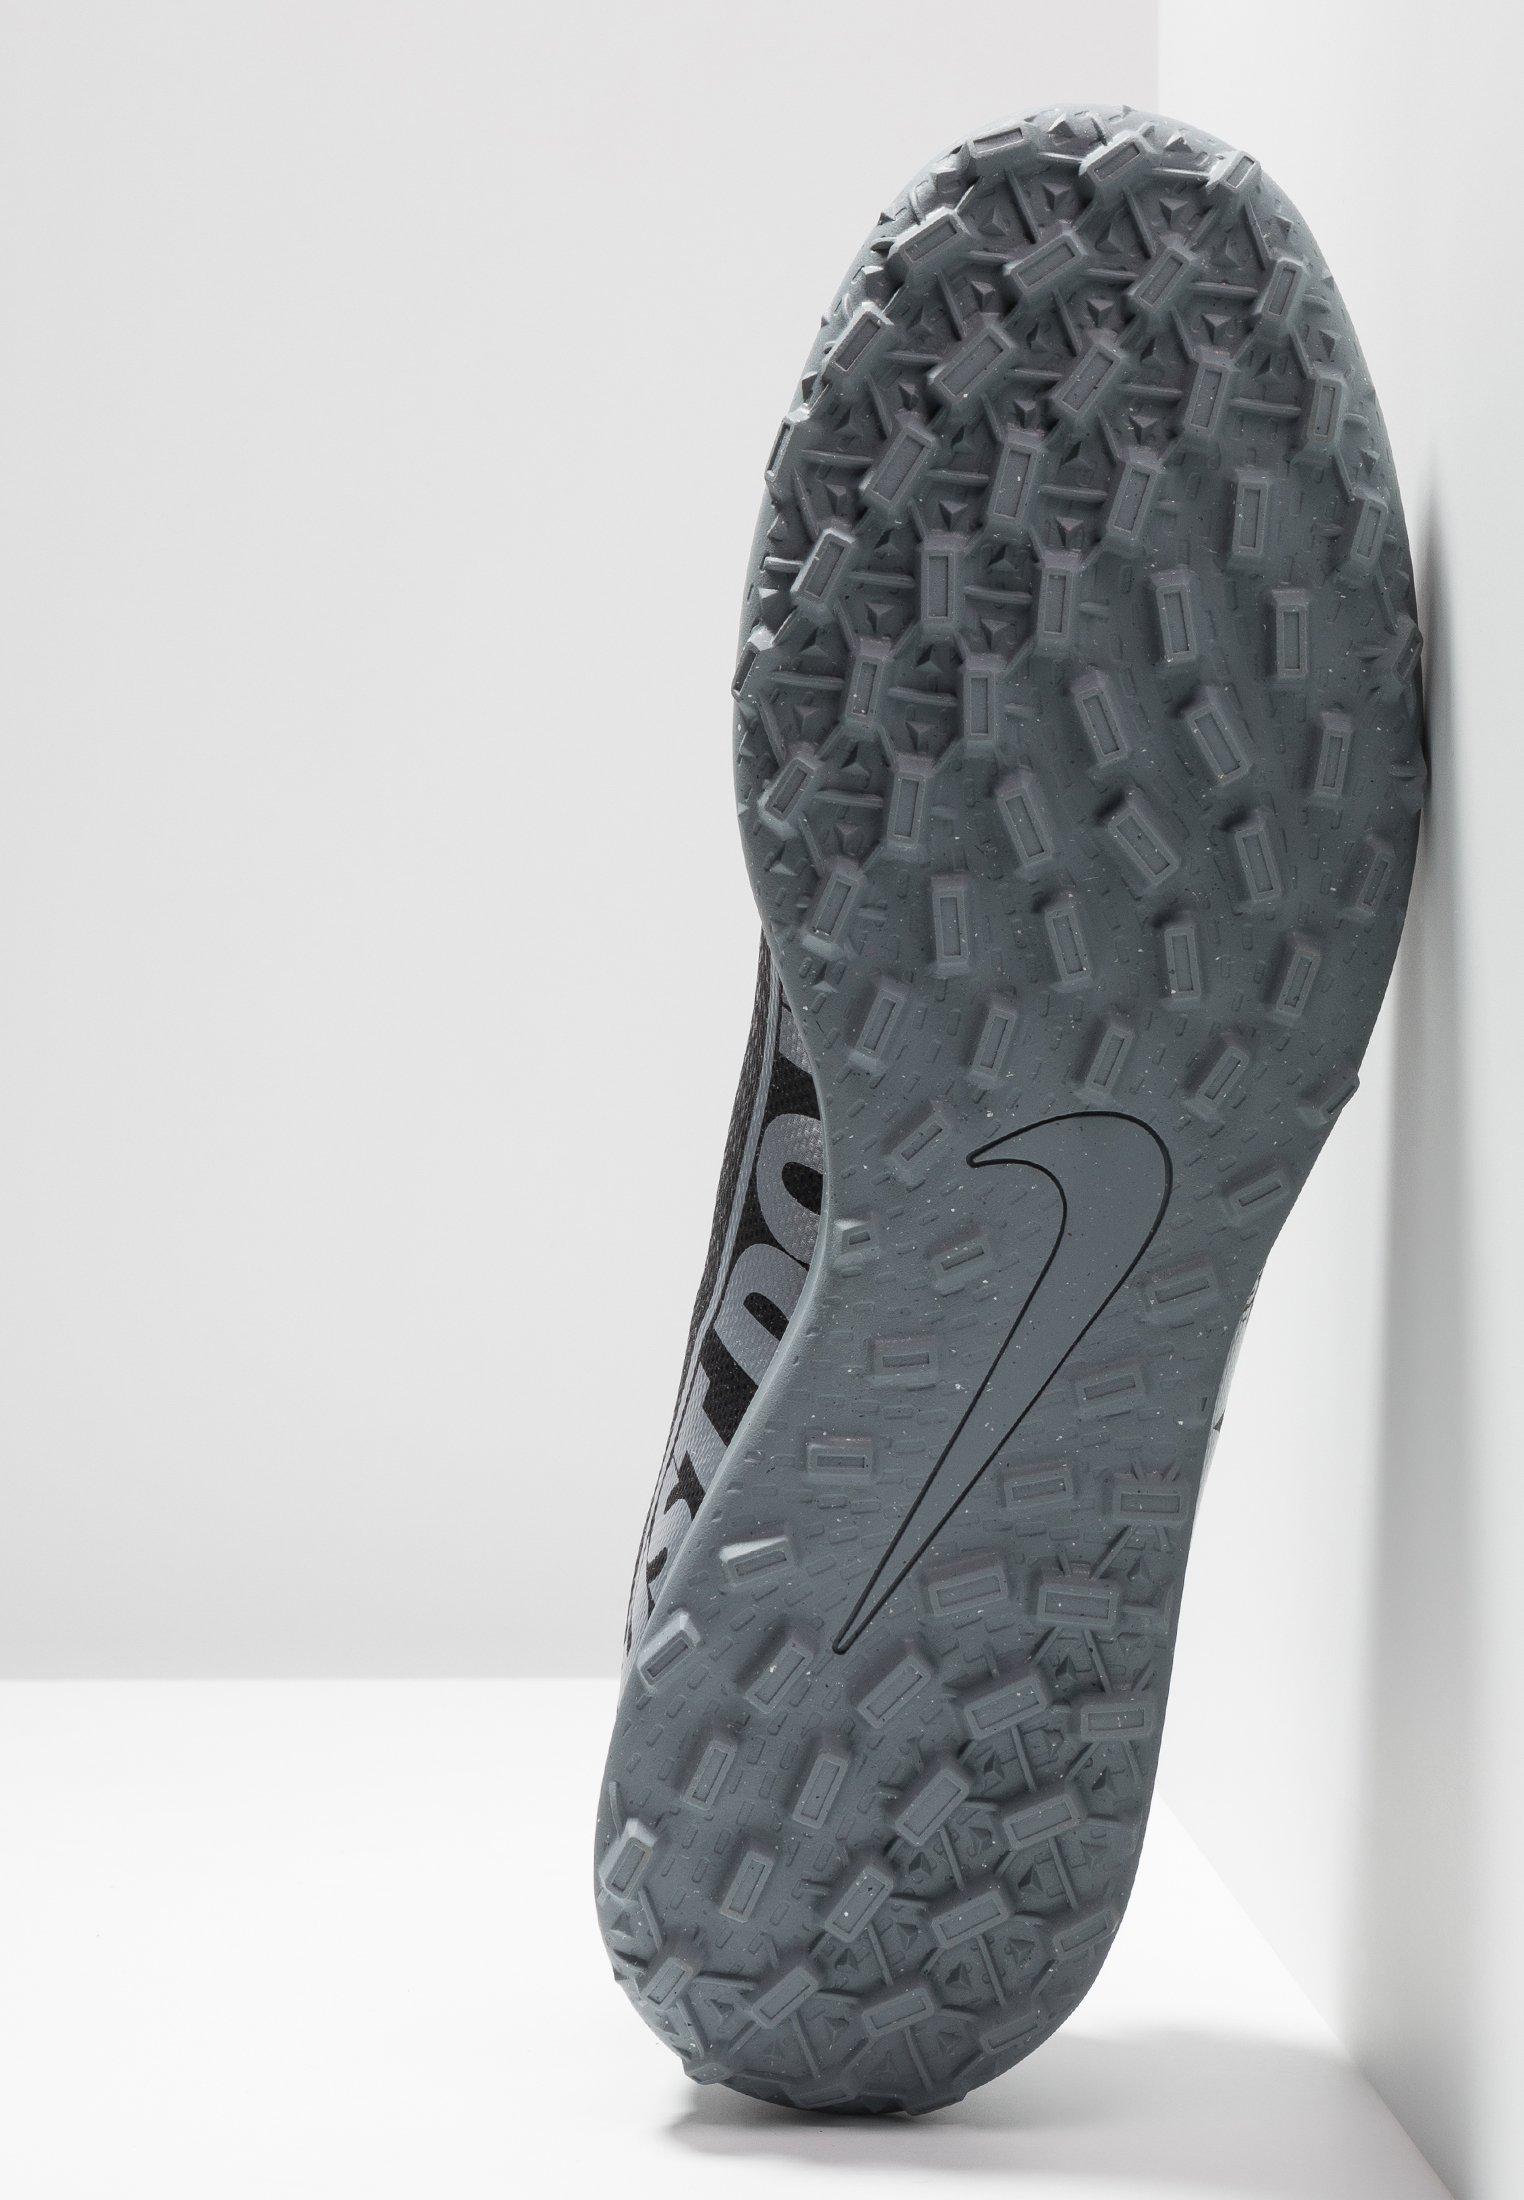 Foot De cool Grey Vapor 13 TfChaussures Multicrampons Black Performance Club metallic Nike Grey Cool SzVqMGUp